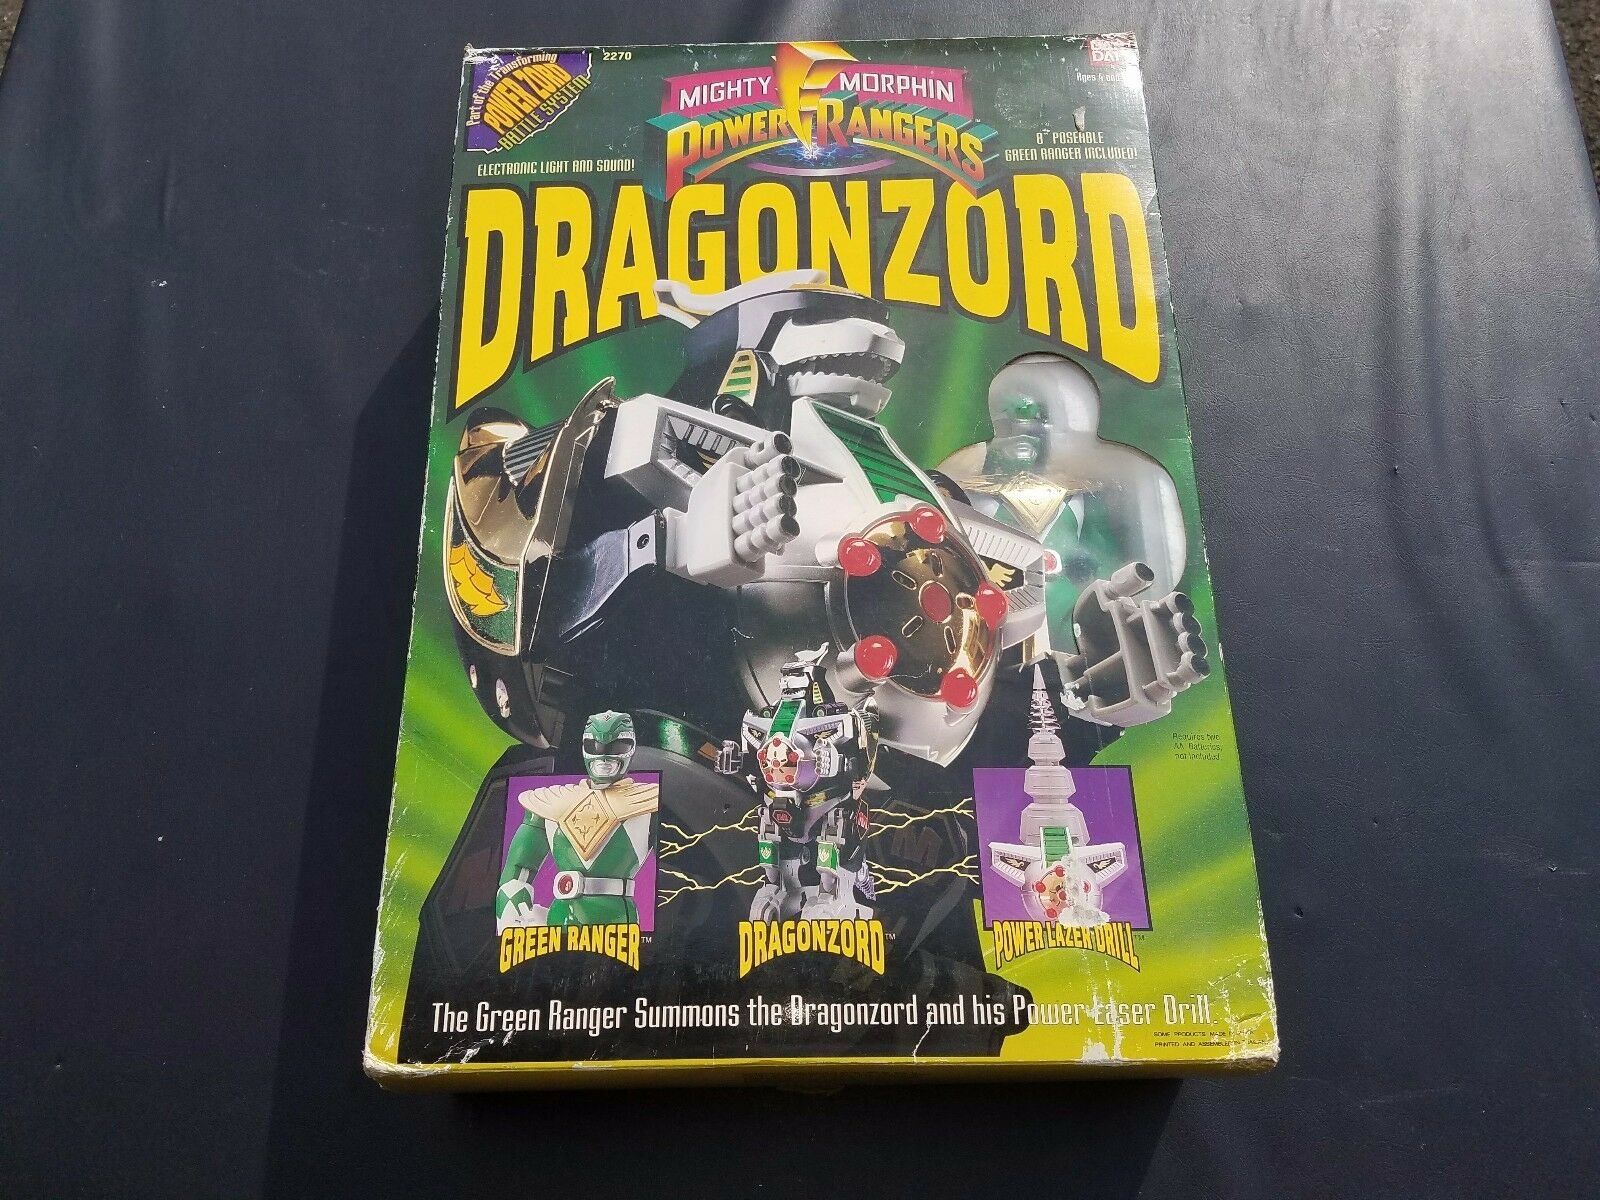 1993 Bandai Mighty Morphin Power Rangers DRAGONZORD & Grün RANGER 2270